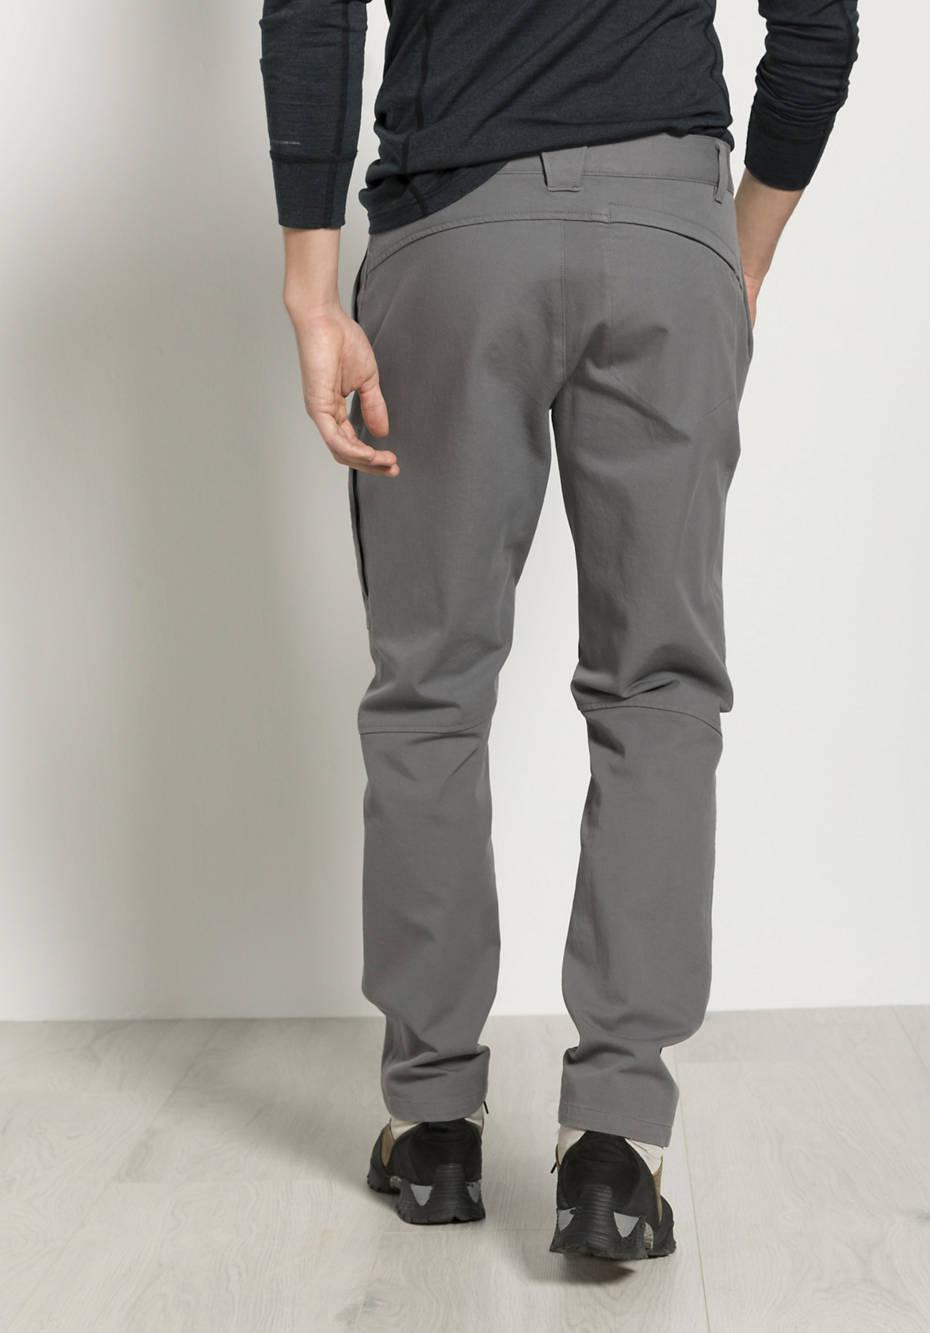 Trekking pants made of organic cotton